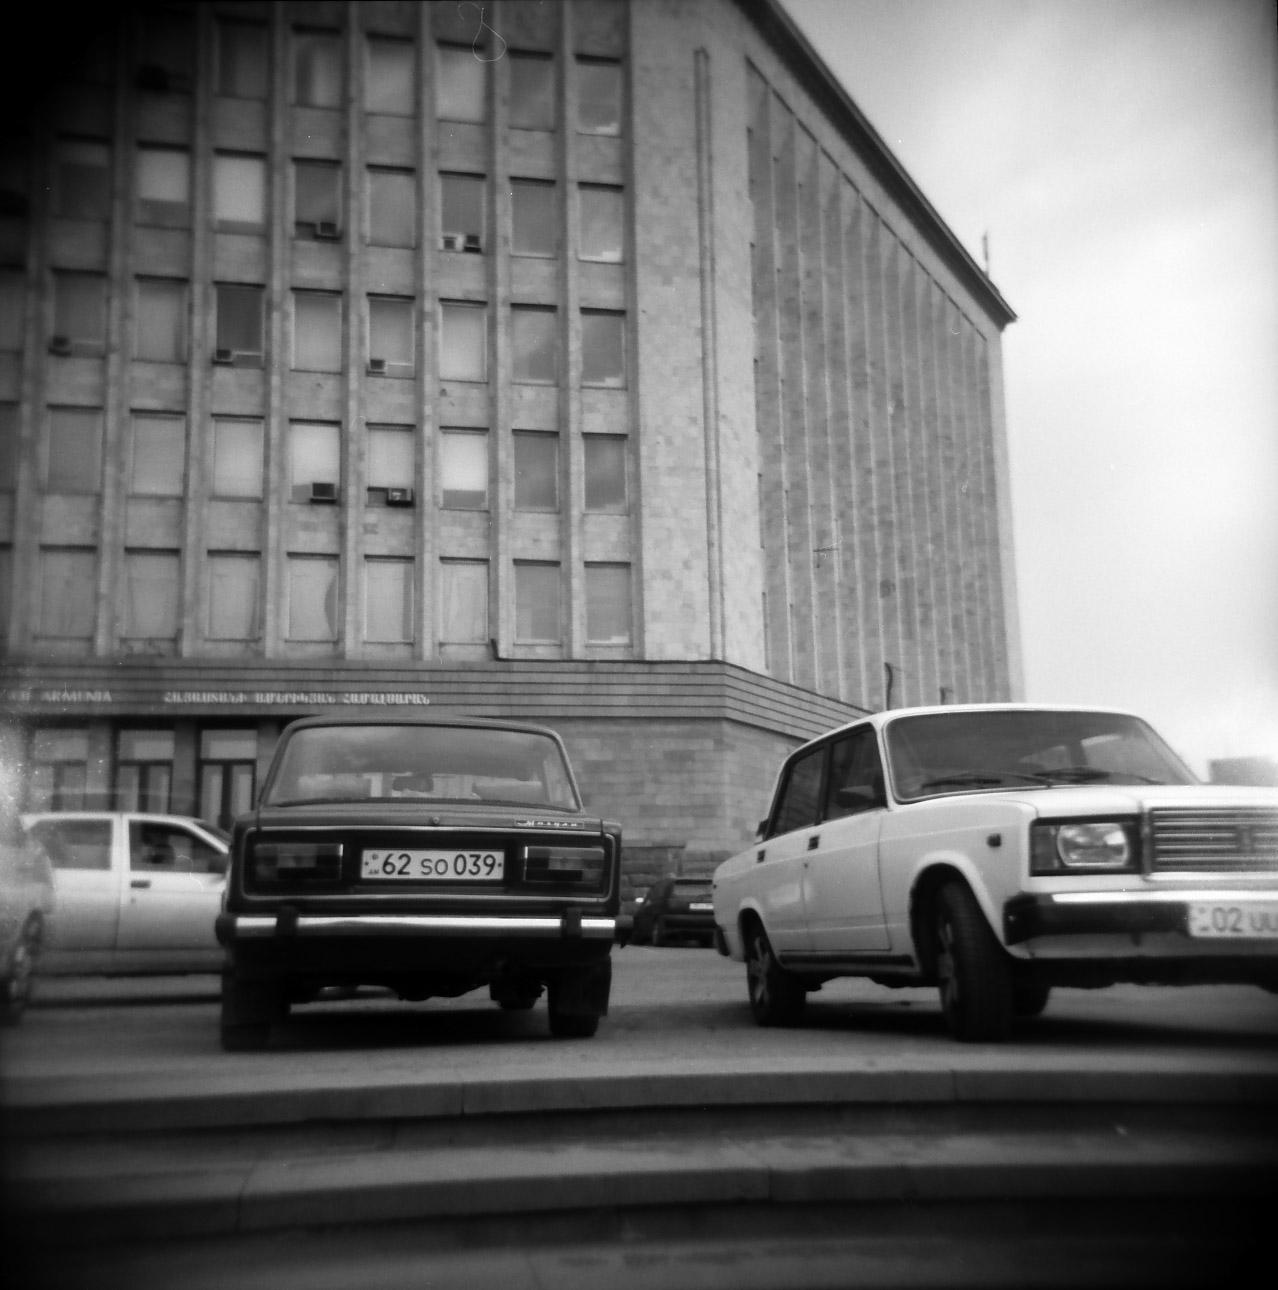 cars parked.jpg